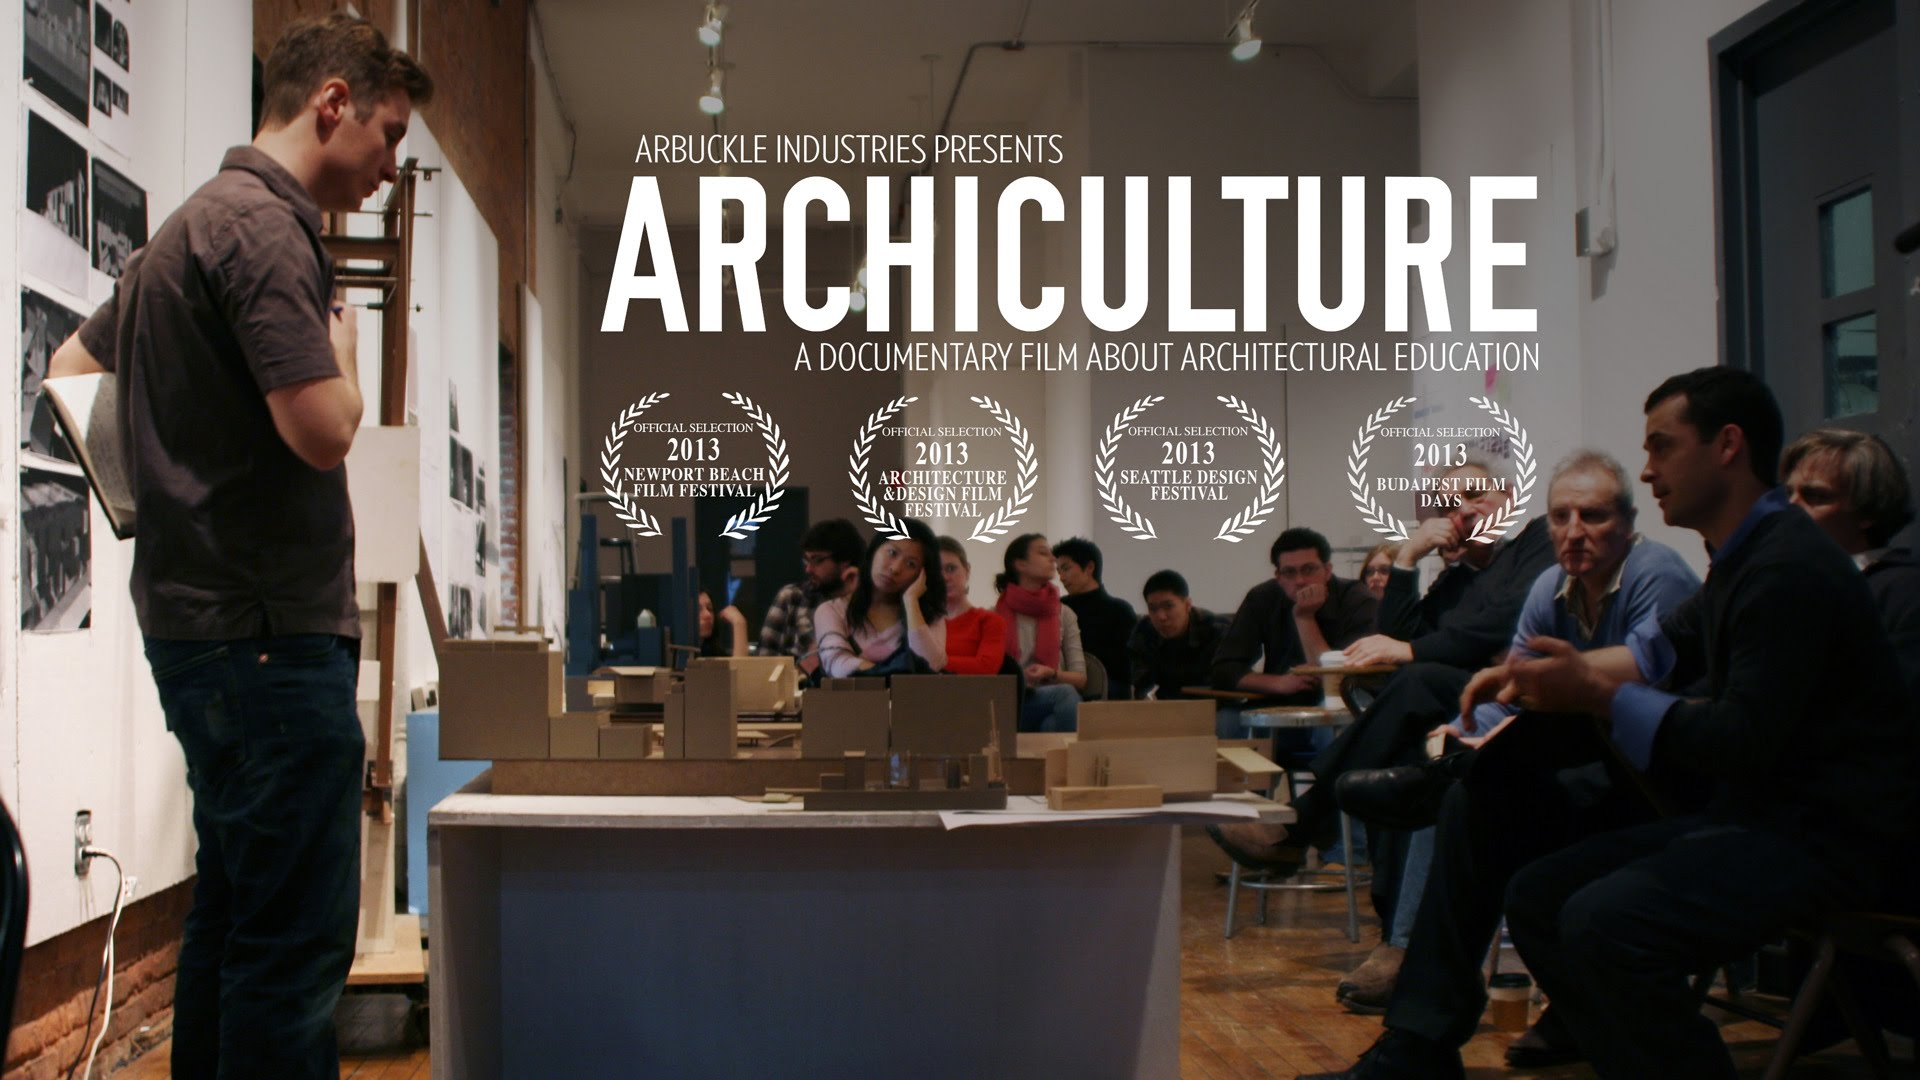 فرهنگــ ــمعماری - ARCHICULTURE